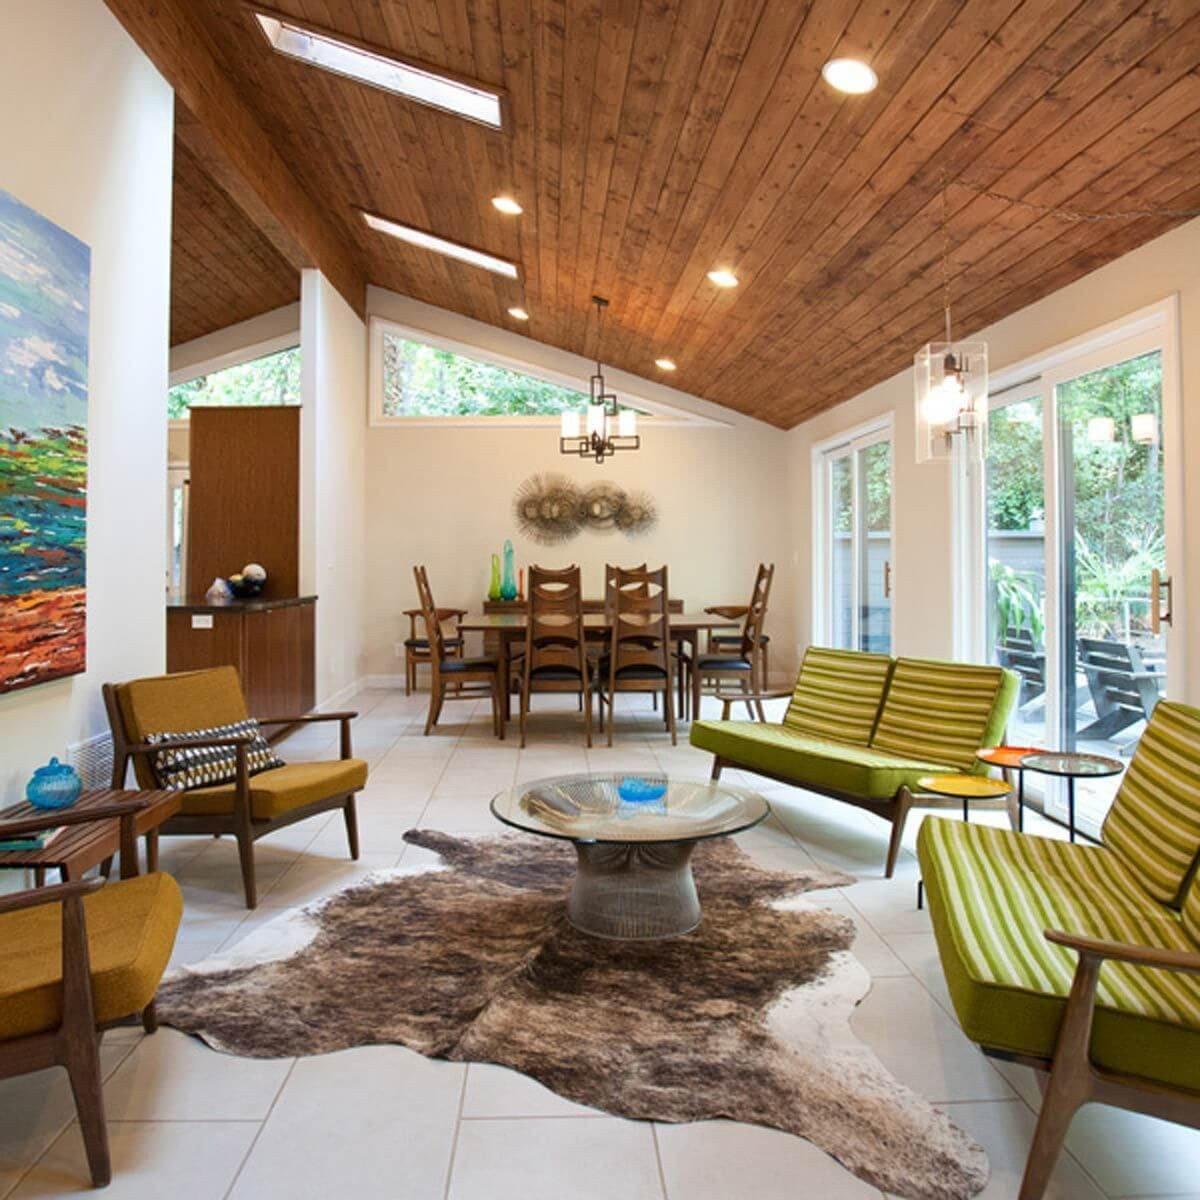 Mid Century Modern Decor Ideas Fresh 14 Iconic Mid Century Modern Decor Elements — Family Handyman